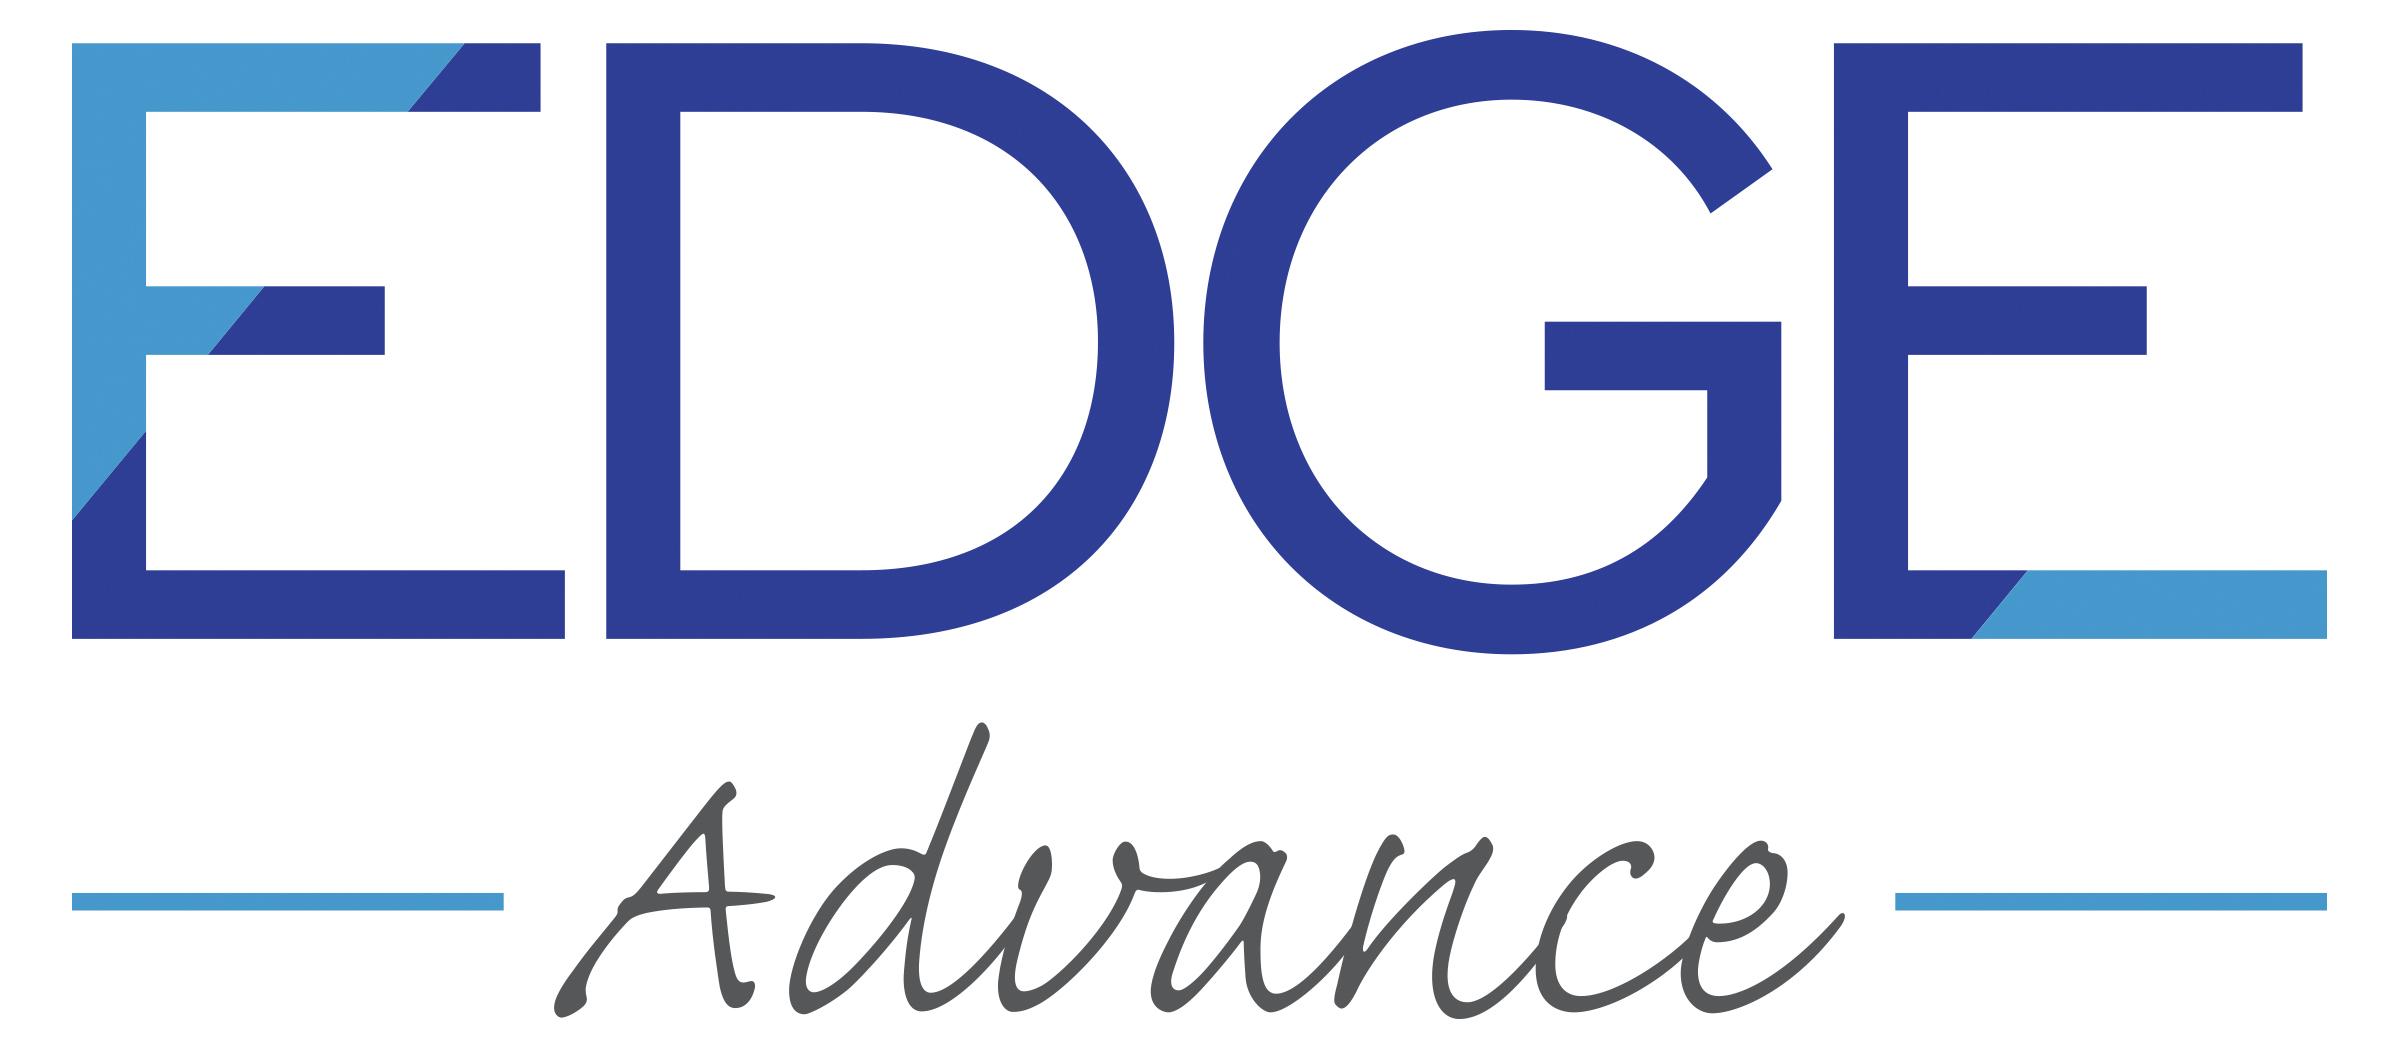 logo, Edge Advance